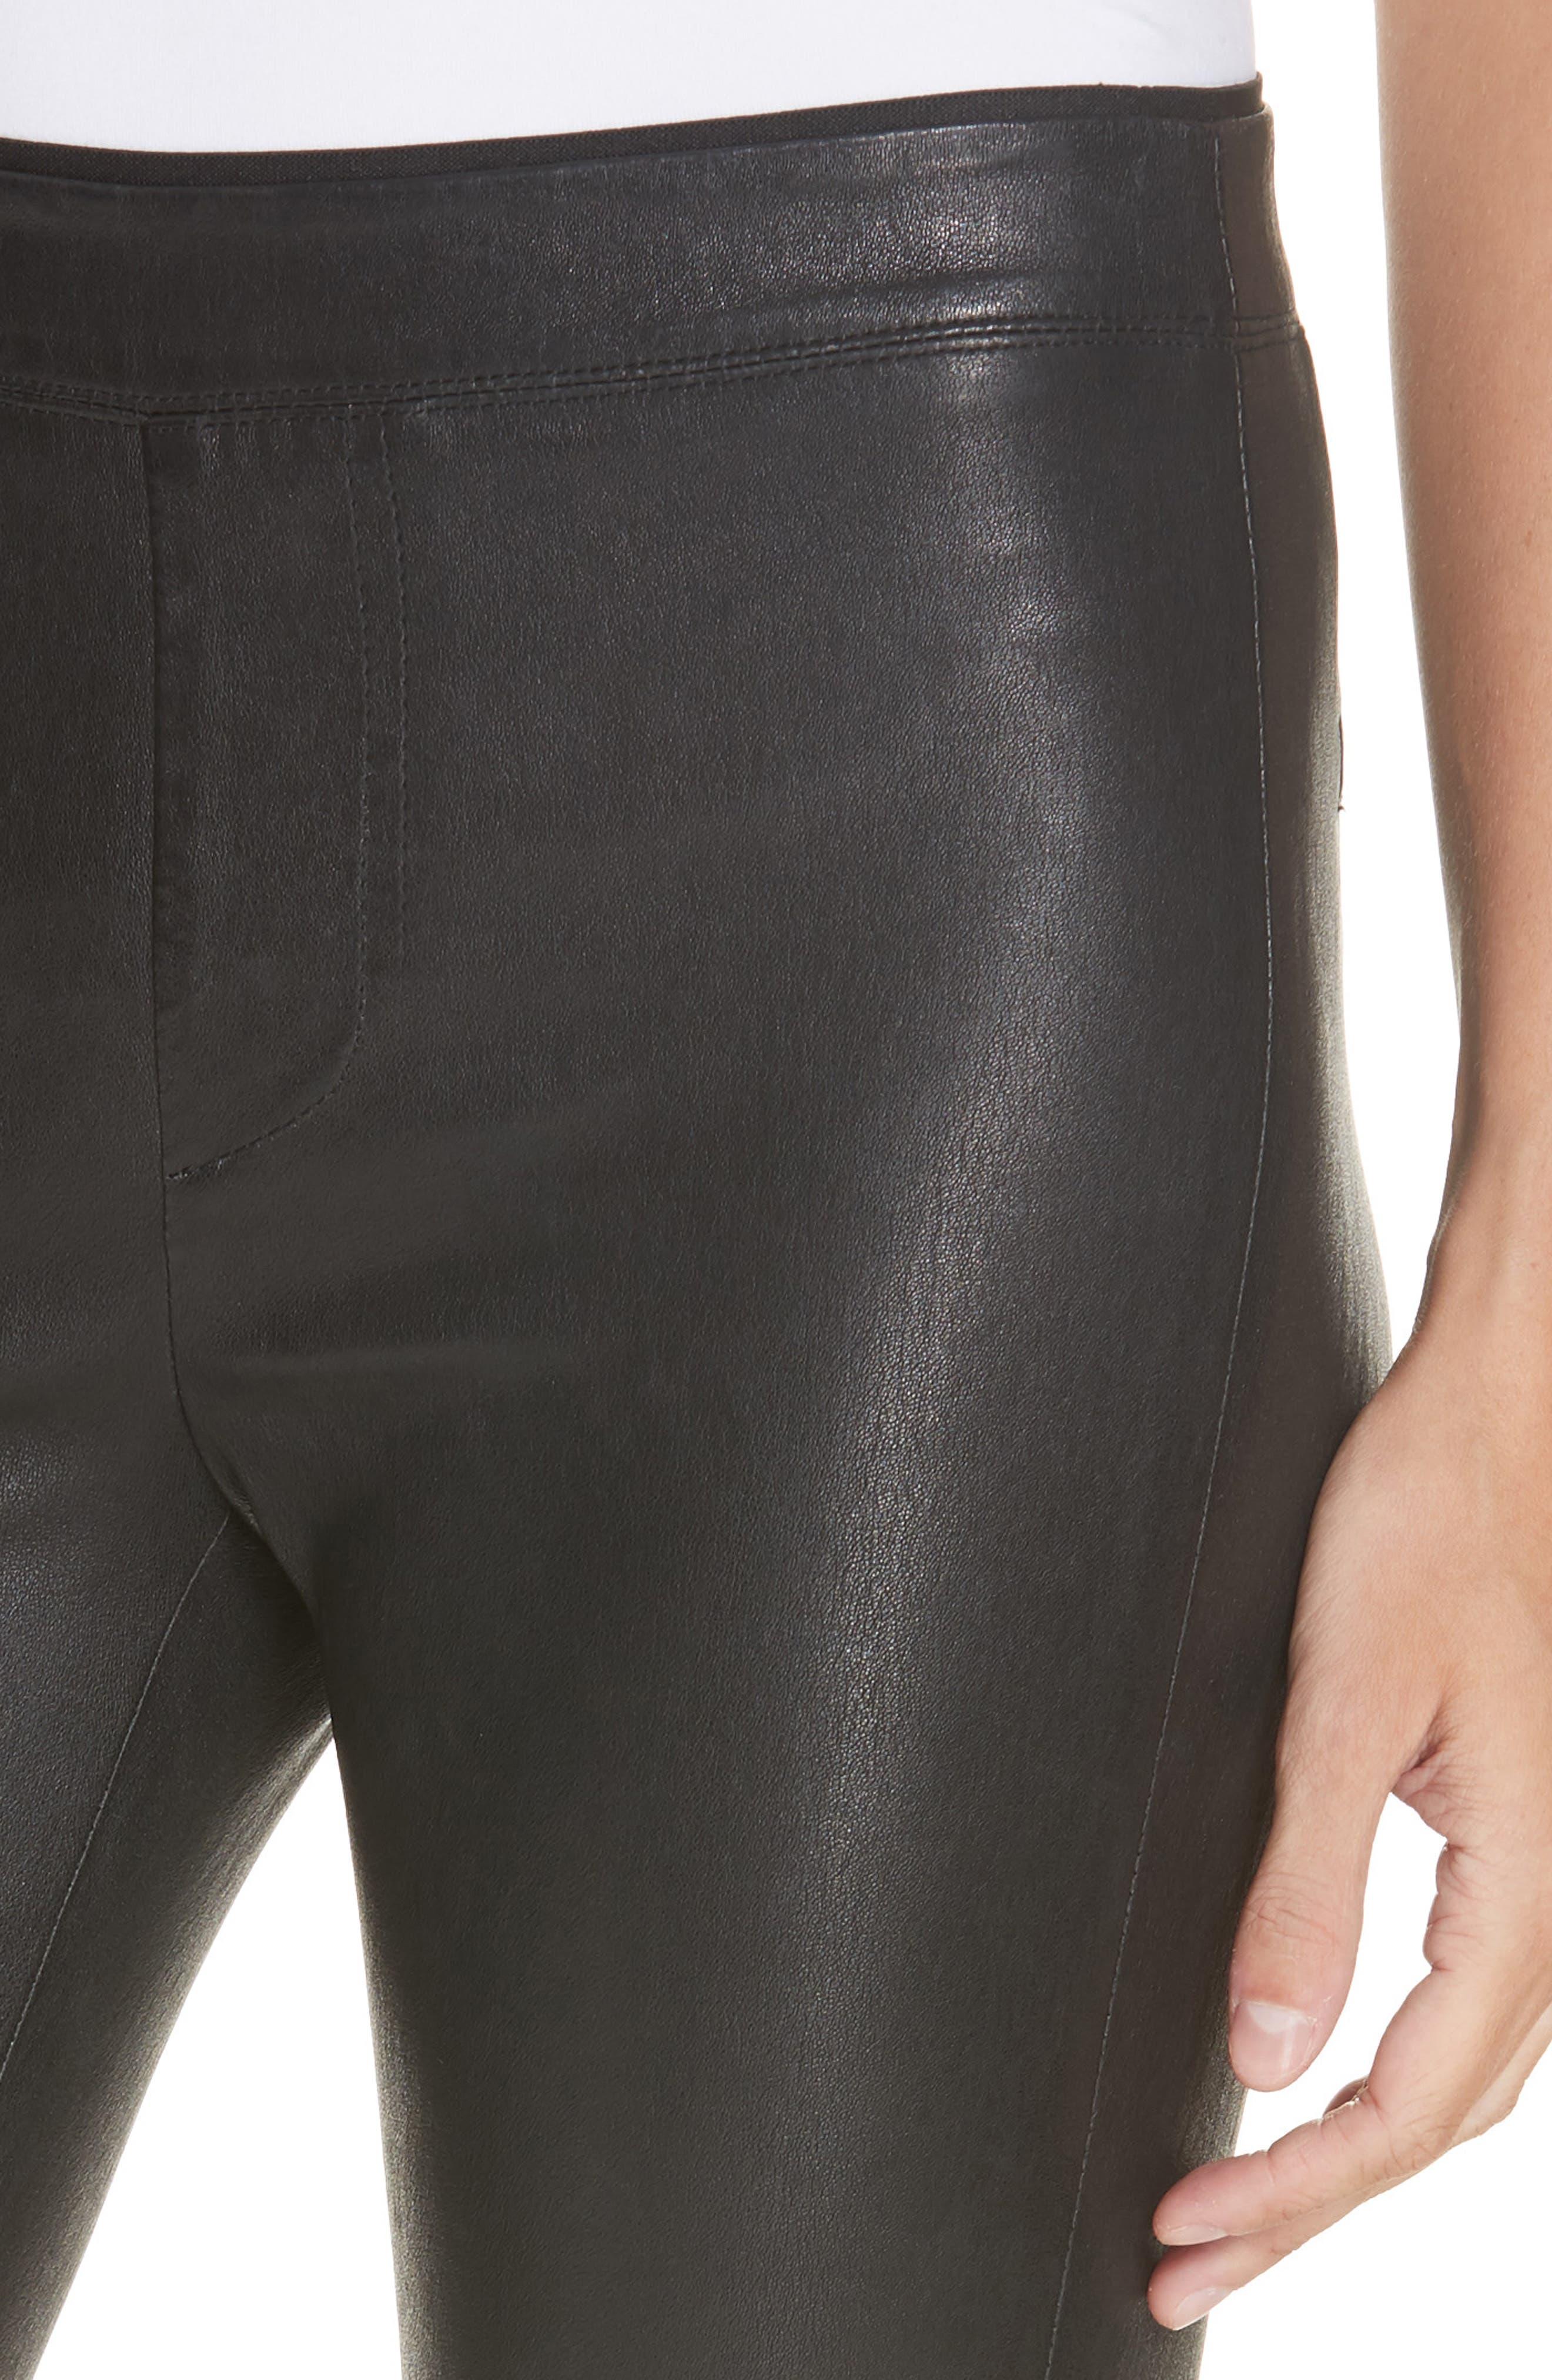 HELMUT LANG, Stretch Lambskin Leather Leggings, Alternate thumbnail 5, color, BLACK